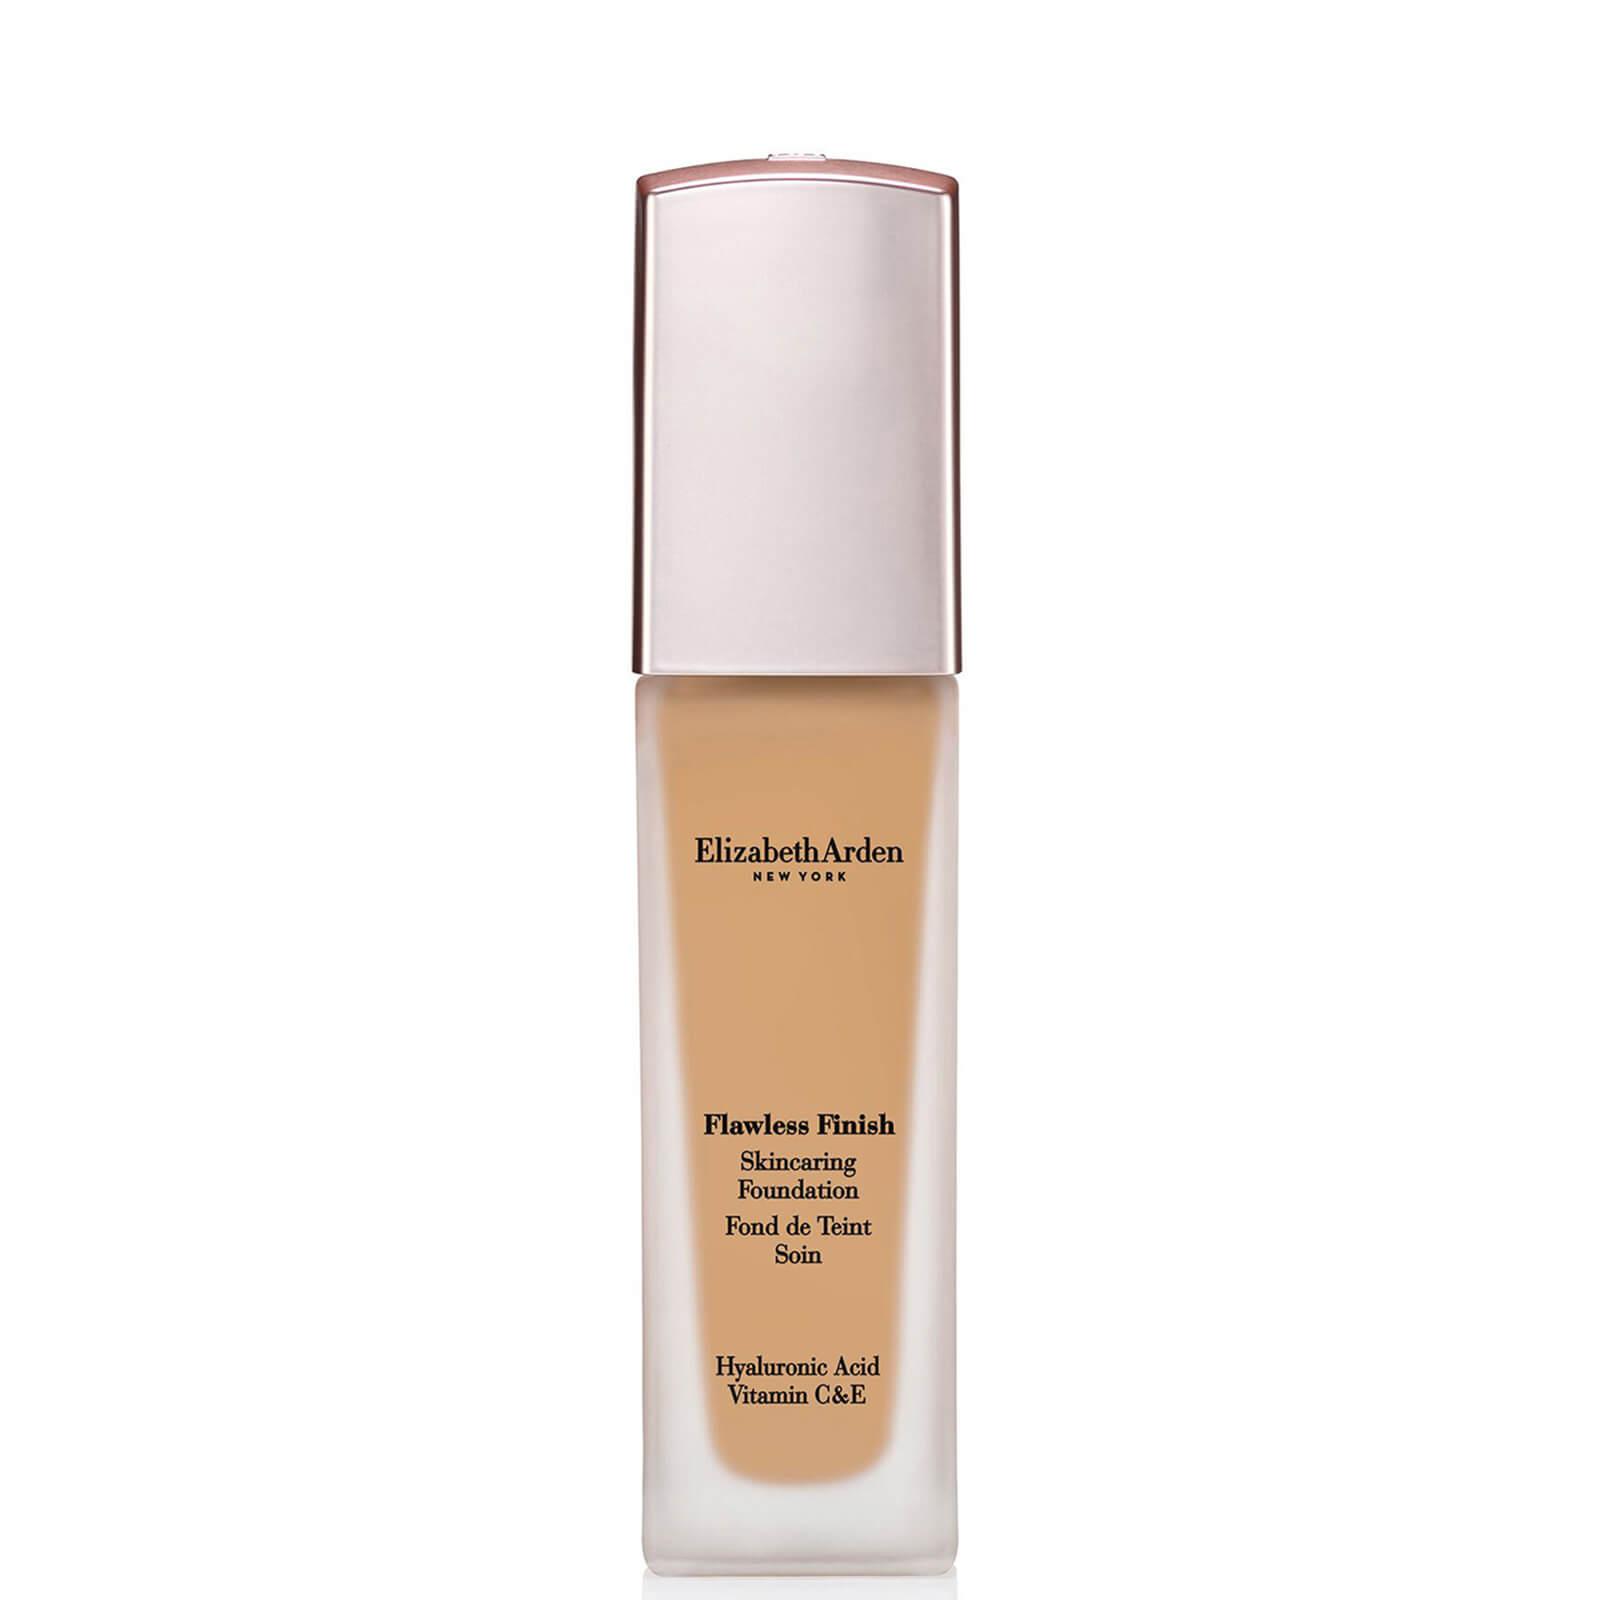 Elizabeth Arden Flawless Finish Skincaring Foundation 30ml (Various Shades) - 320N